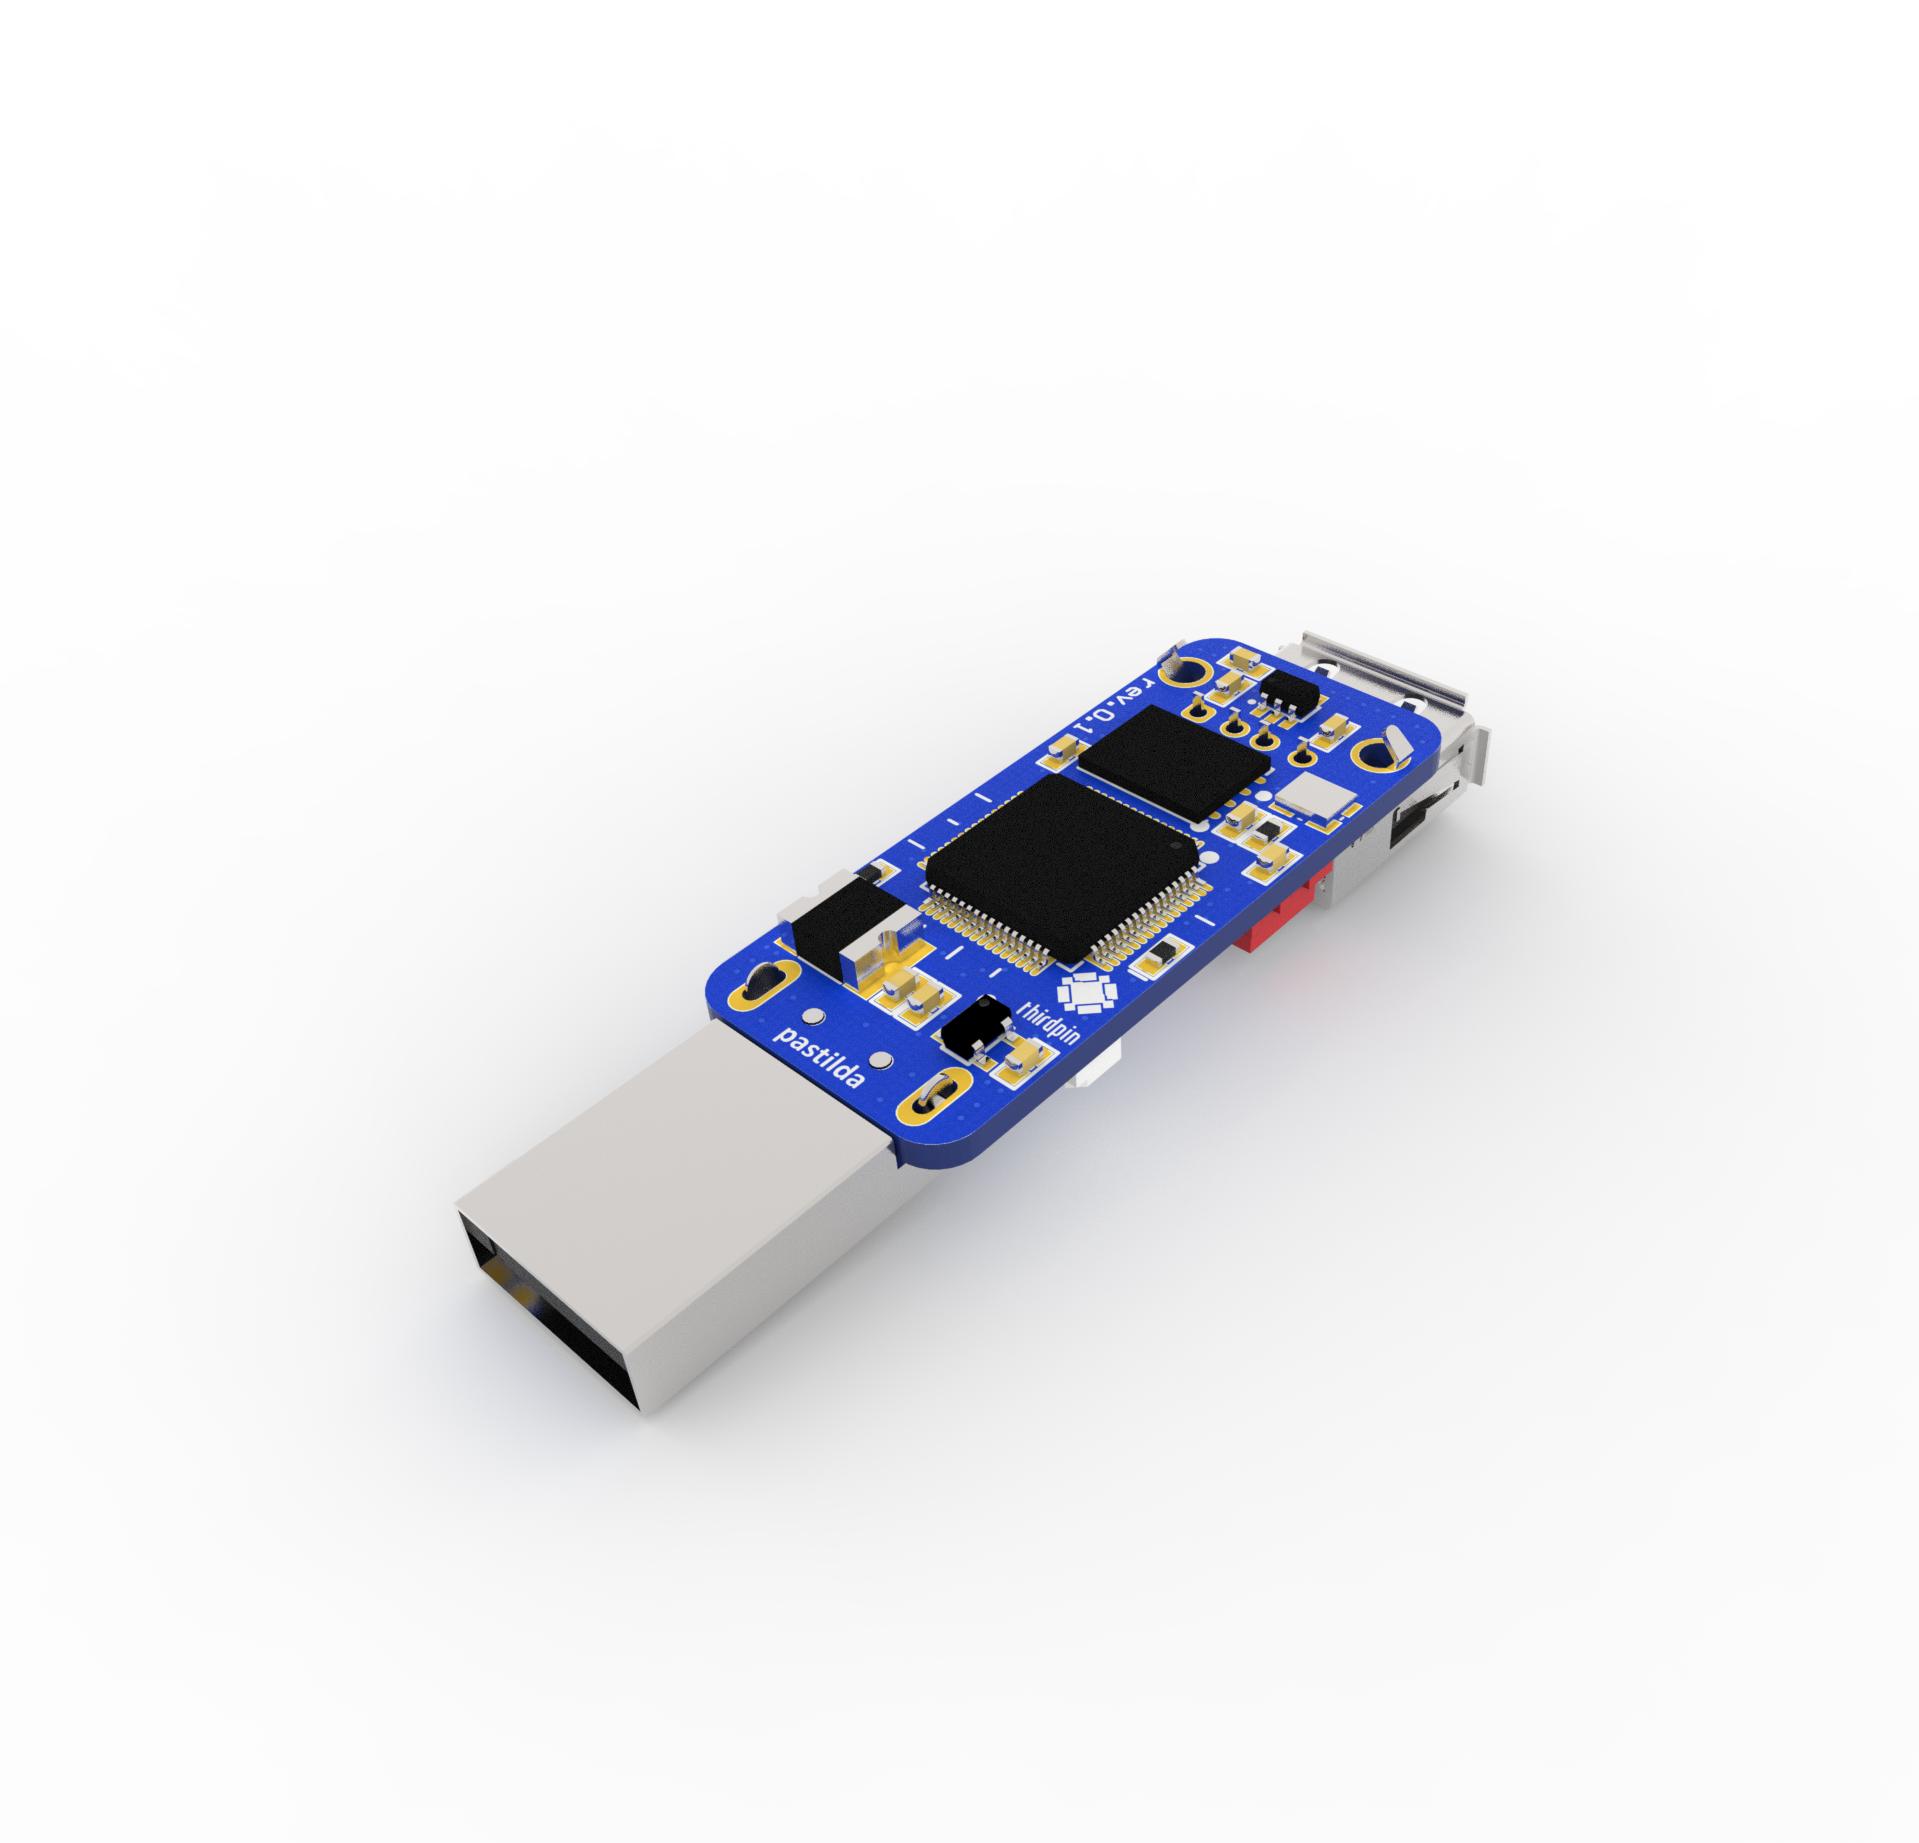 Pastilda — open source аппаратный USB менеджер паролей